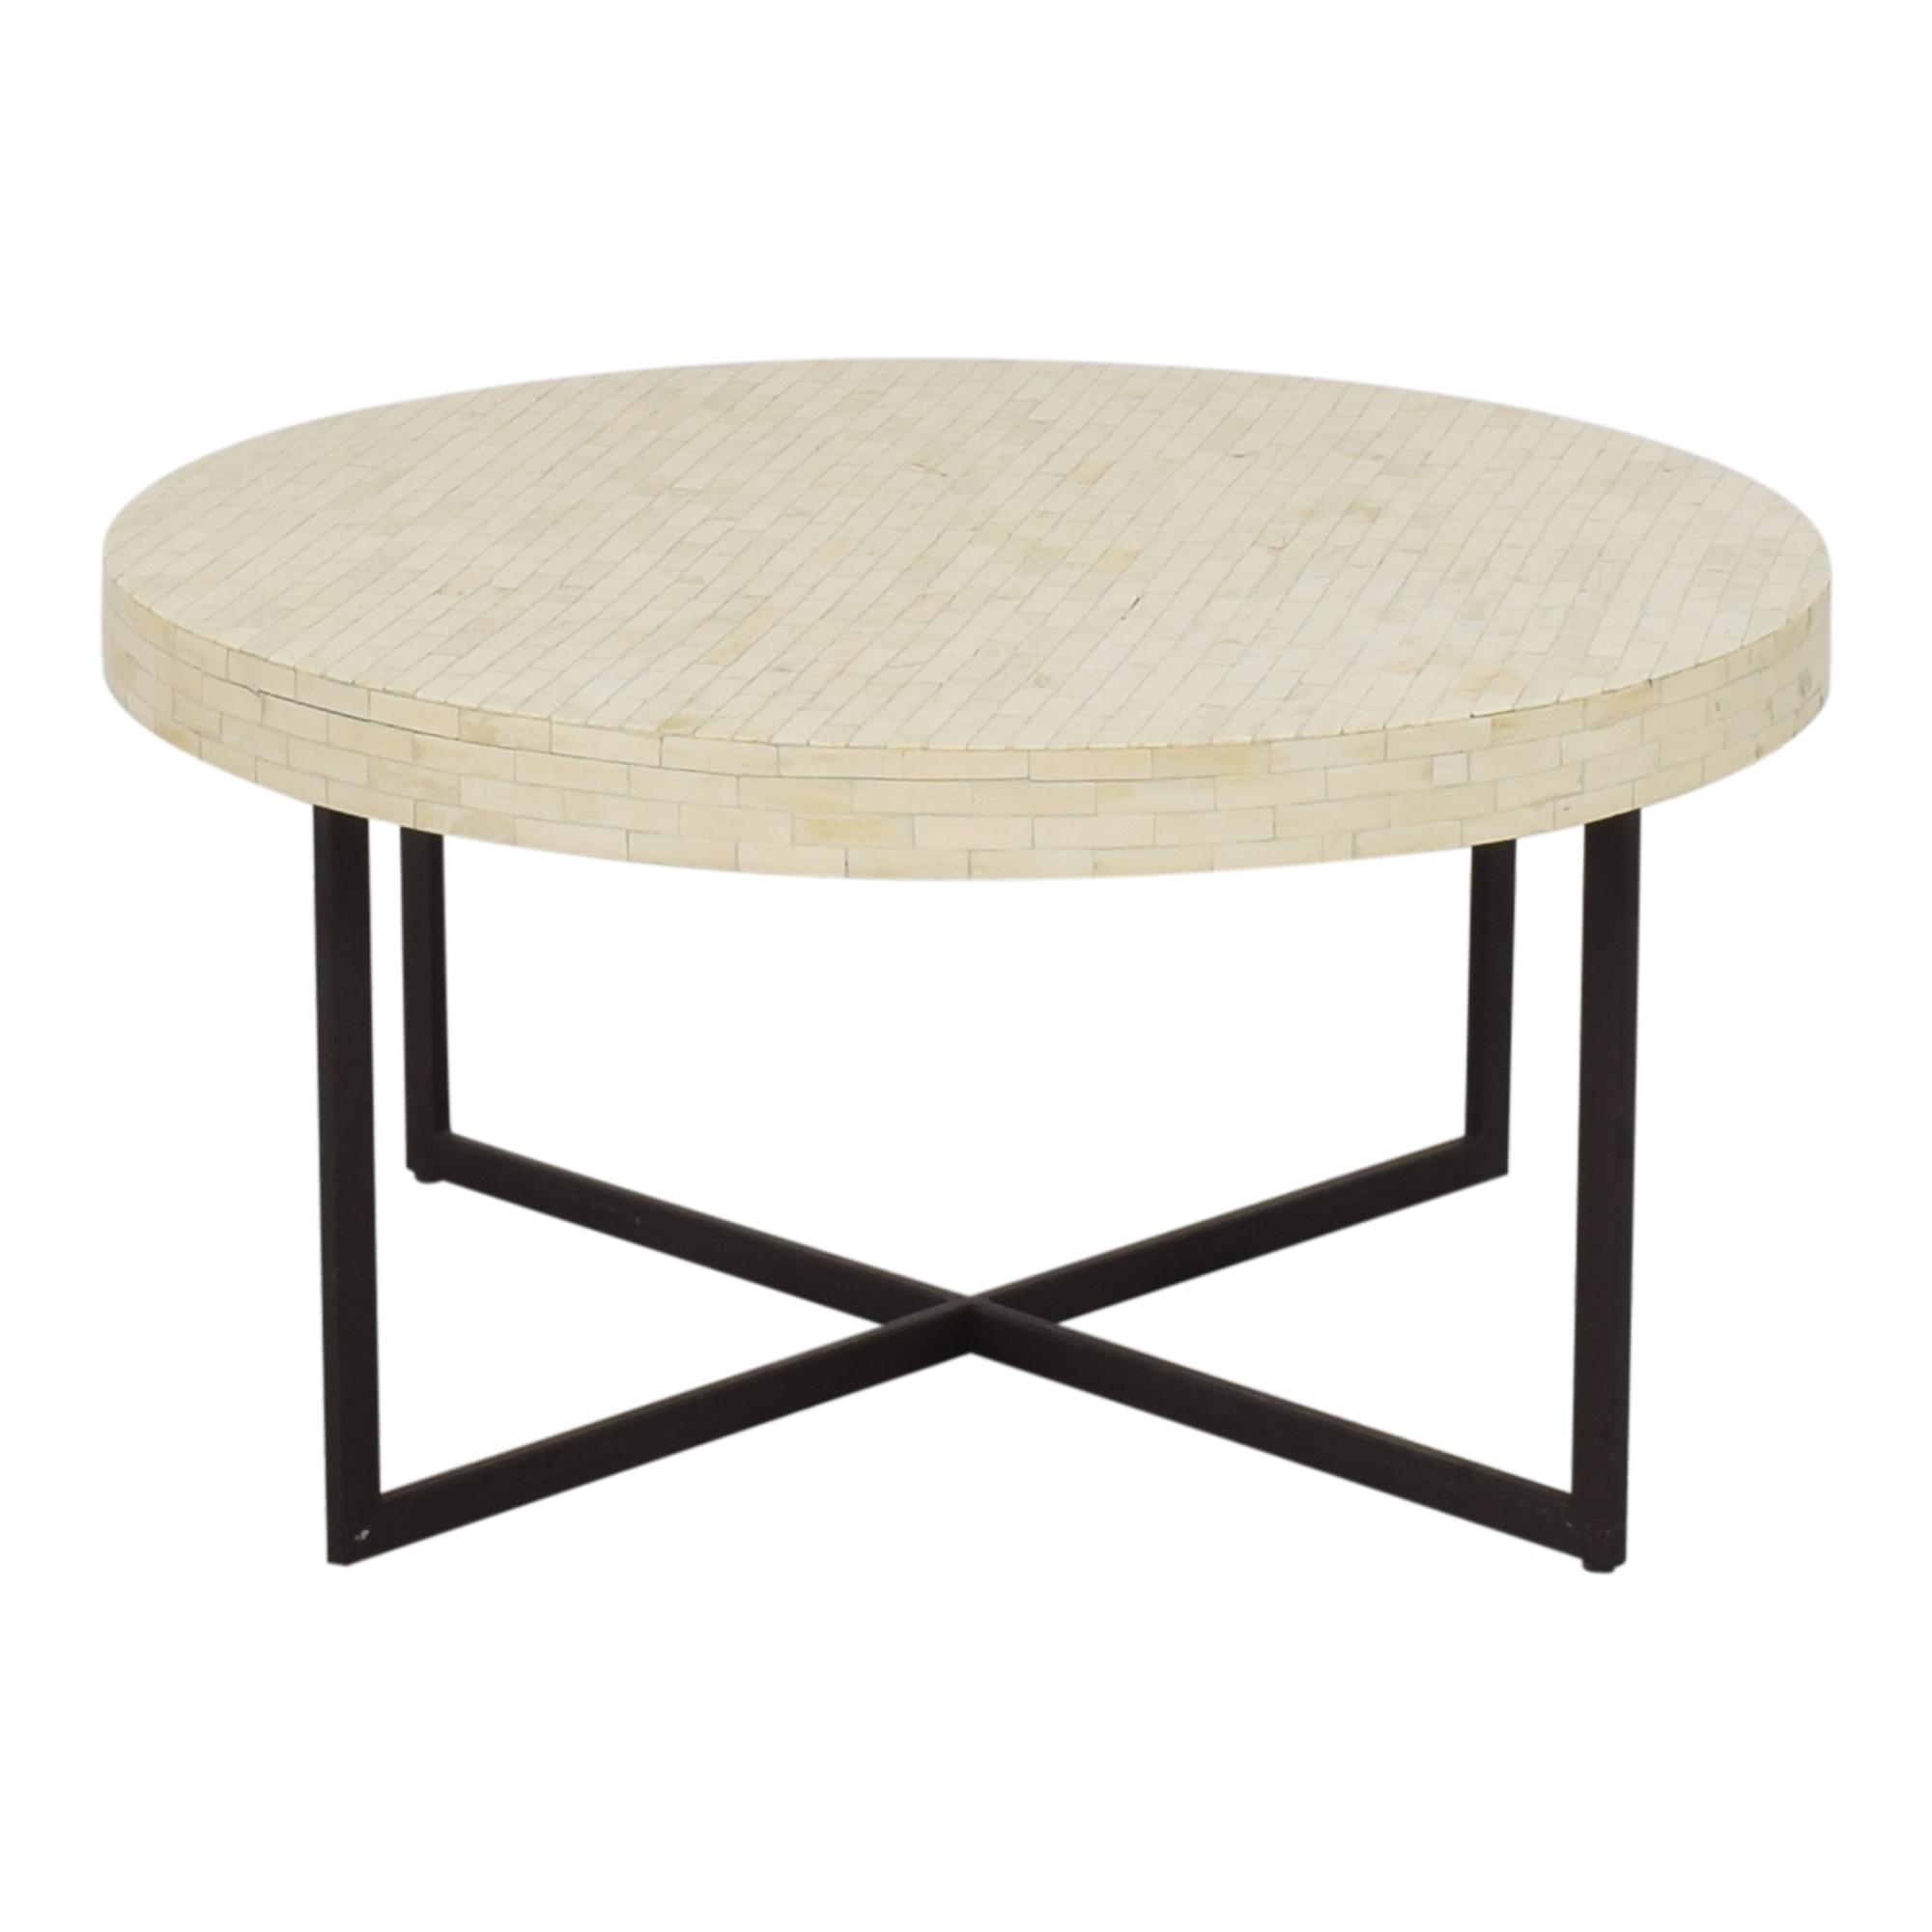 West Elm West Elm Bone Coffee Table ma